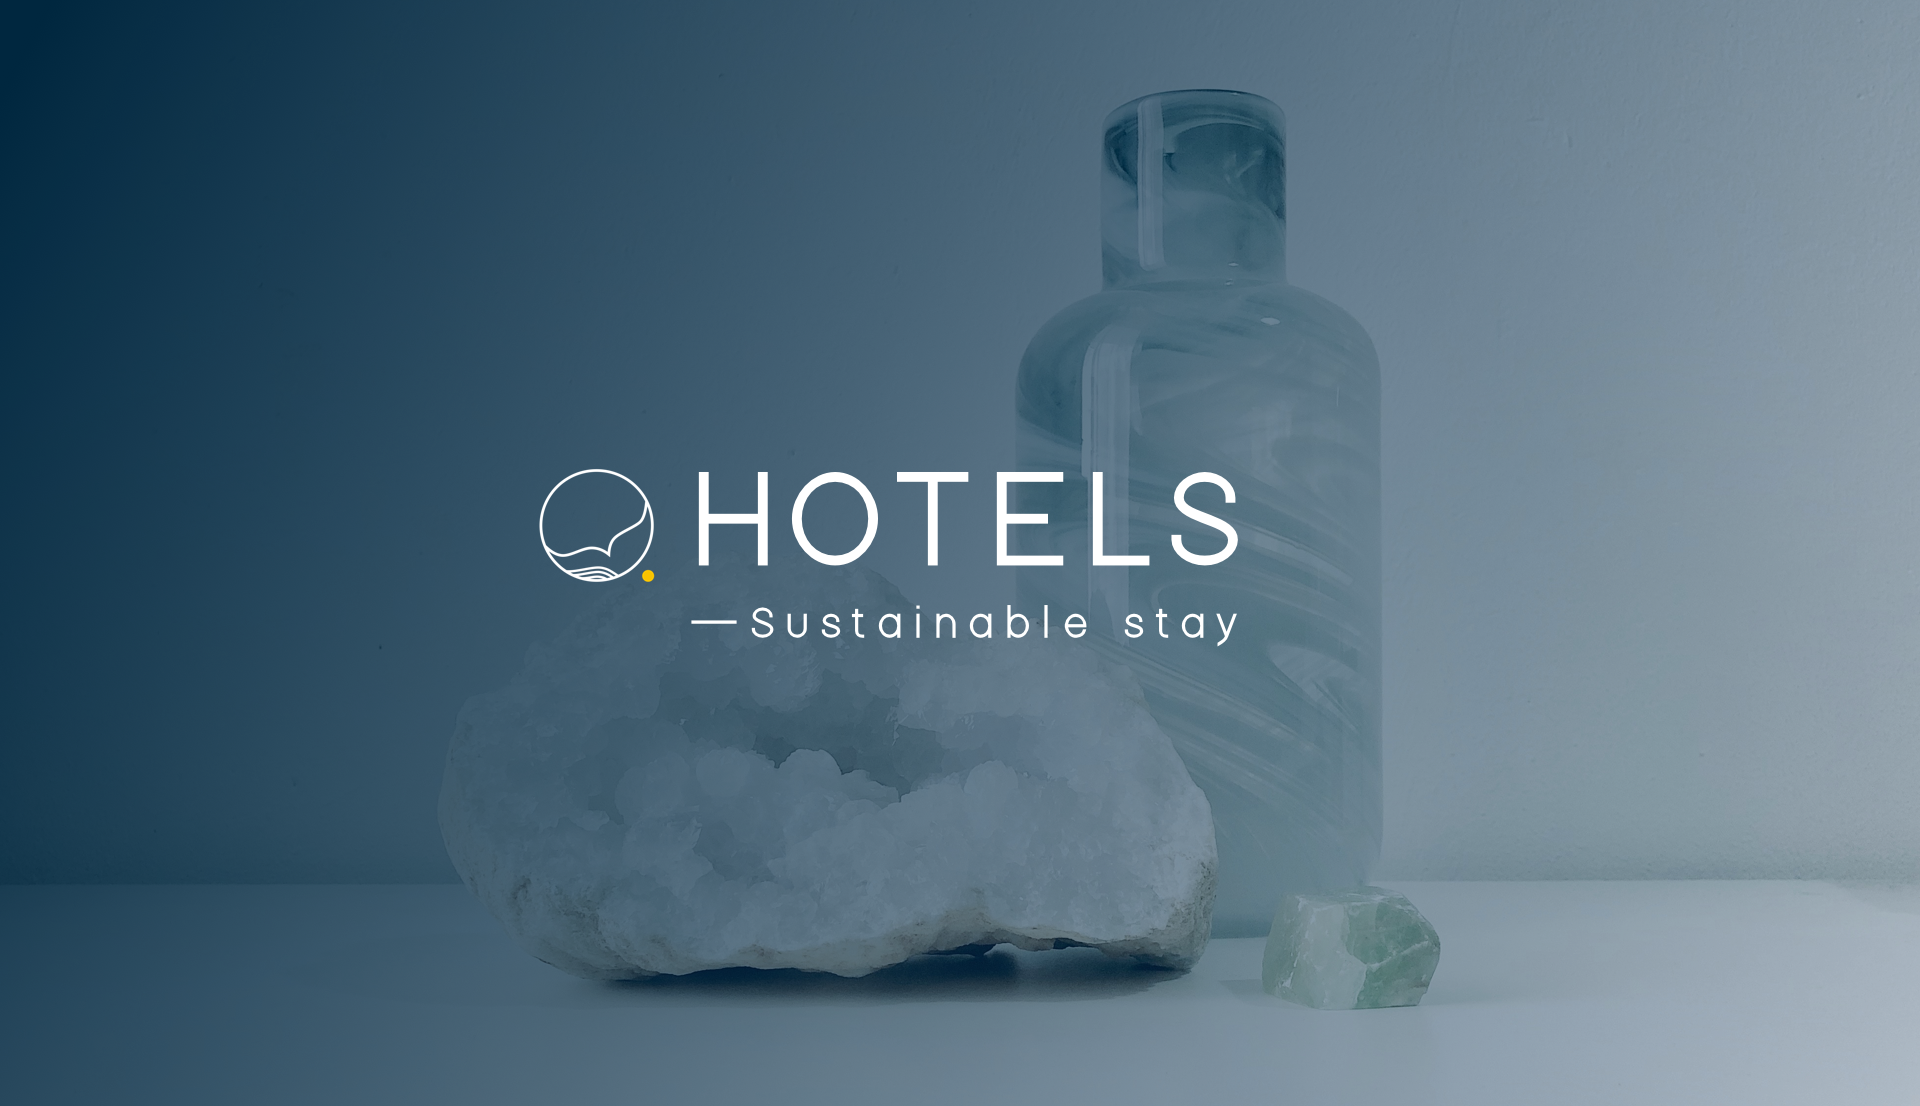 ZERO SINGLE-USE PLASTIC HOTEL